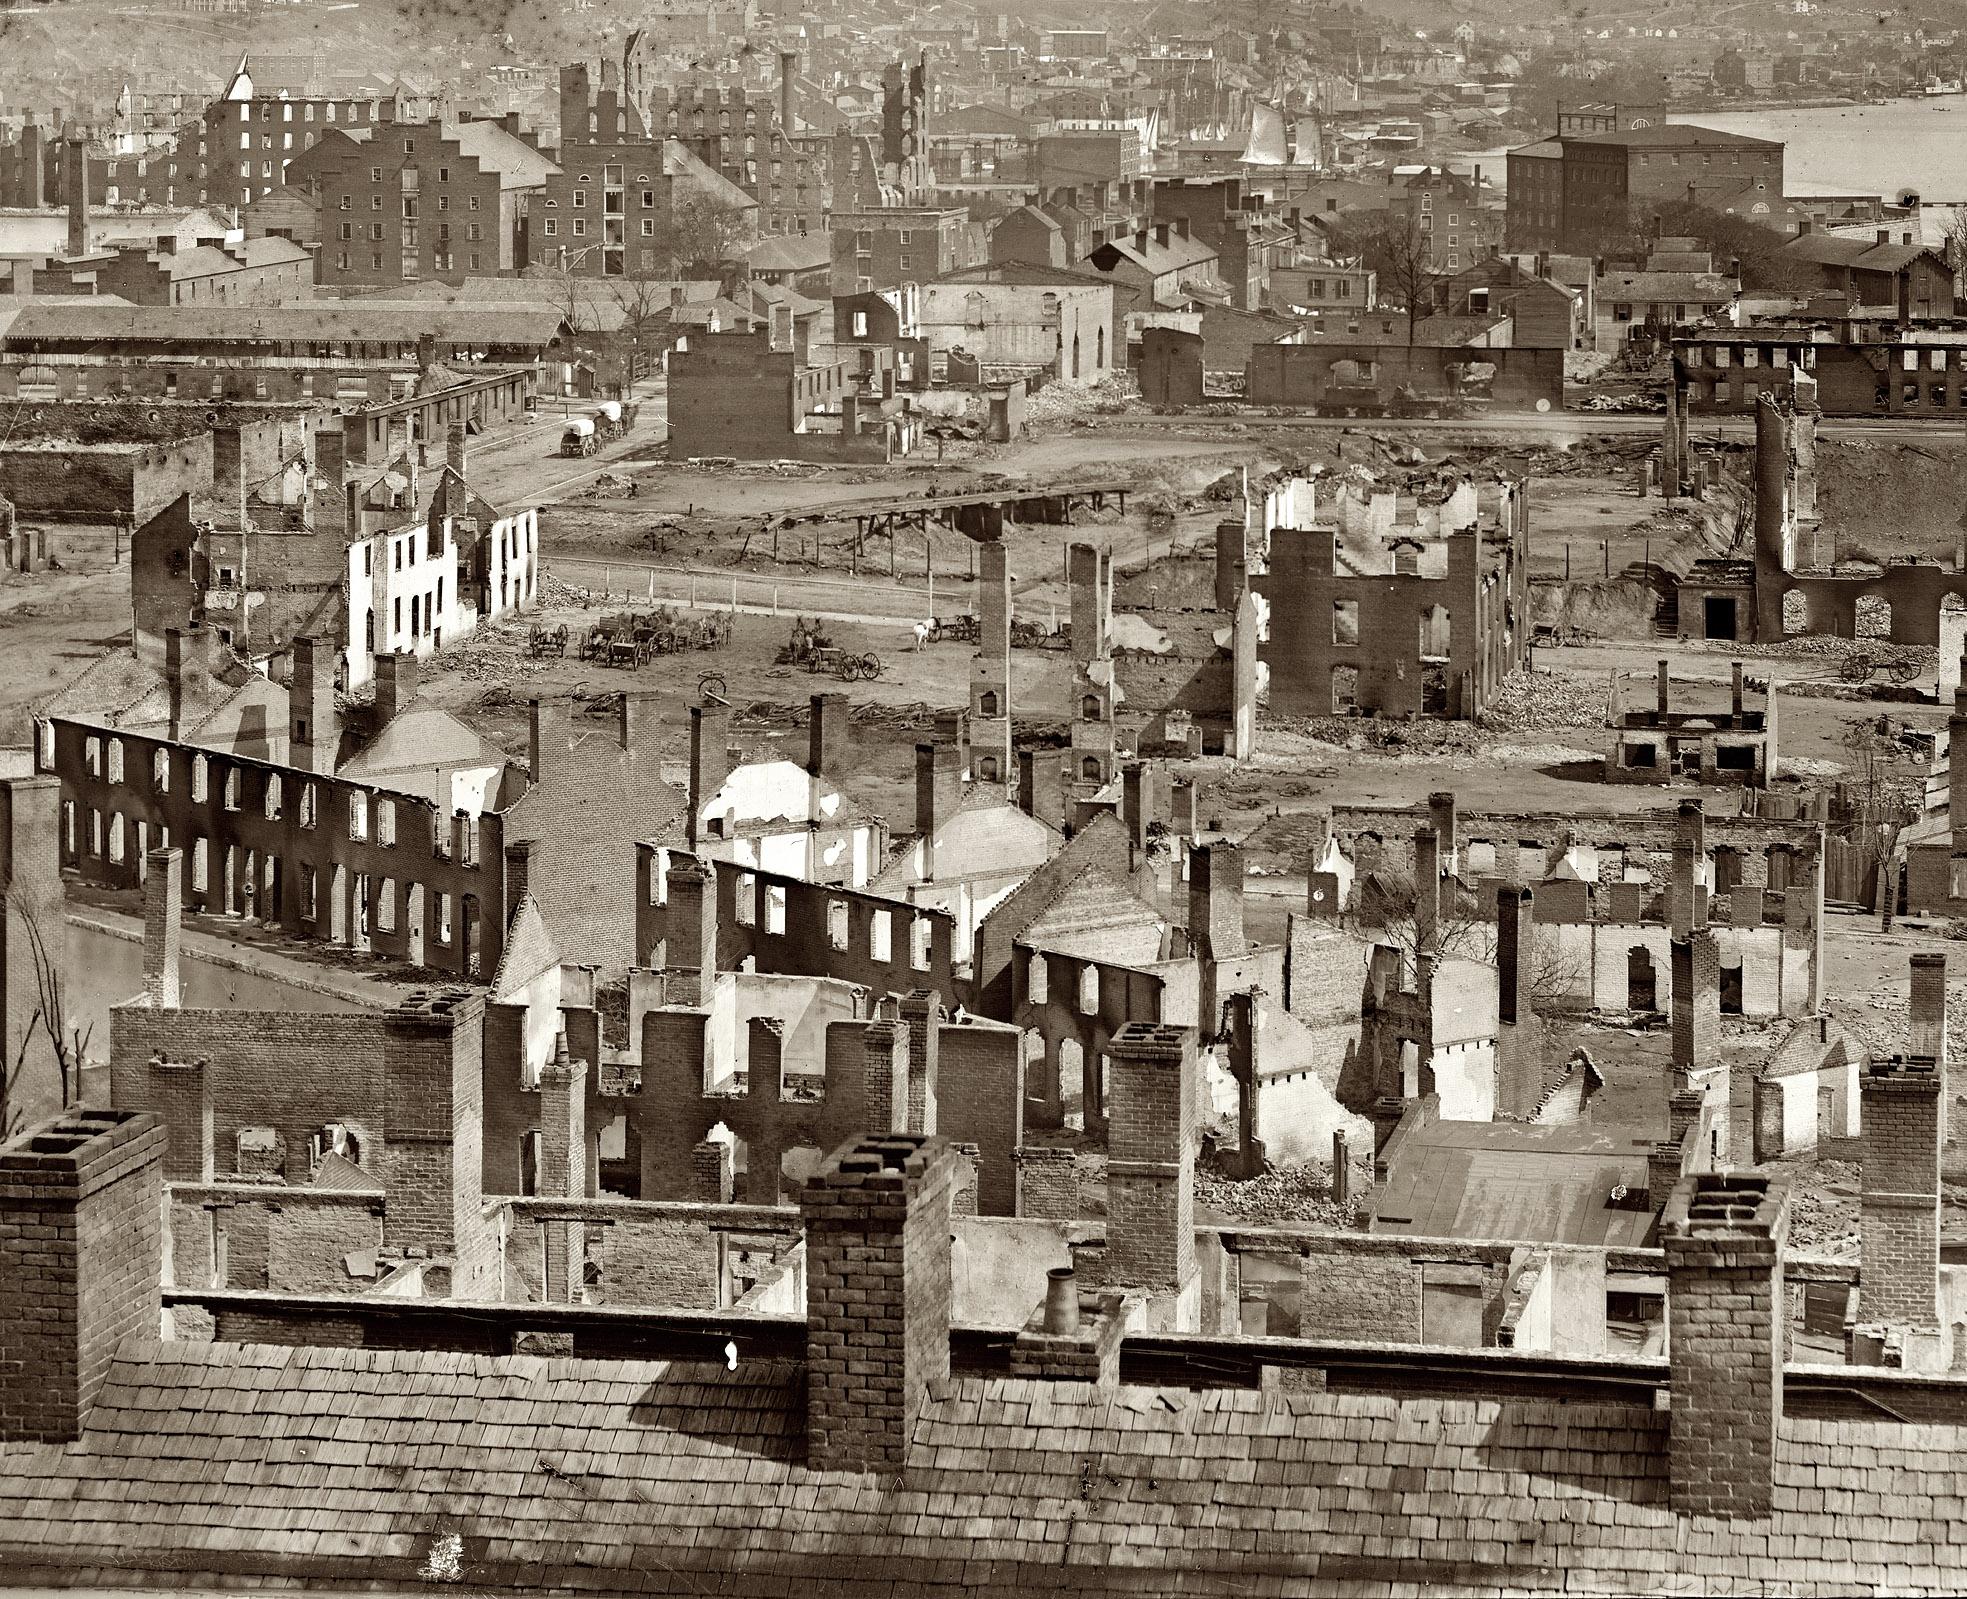 Richmond_in_Ruins_1865